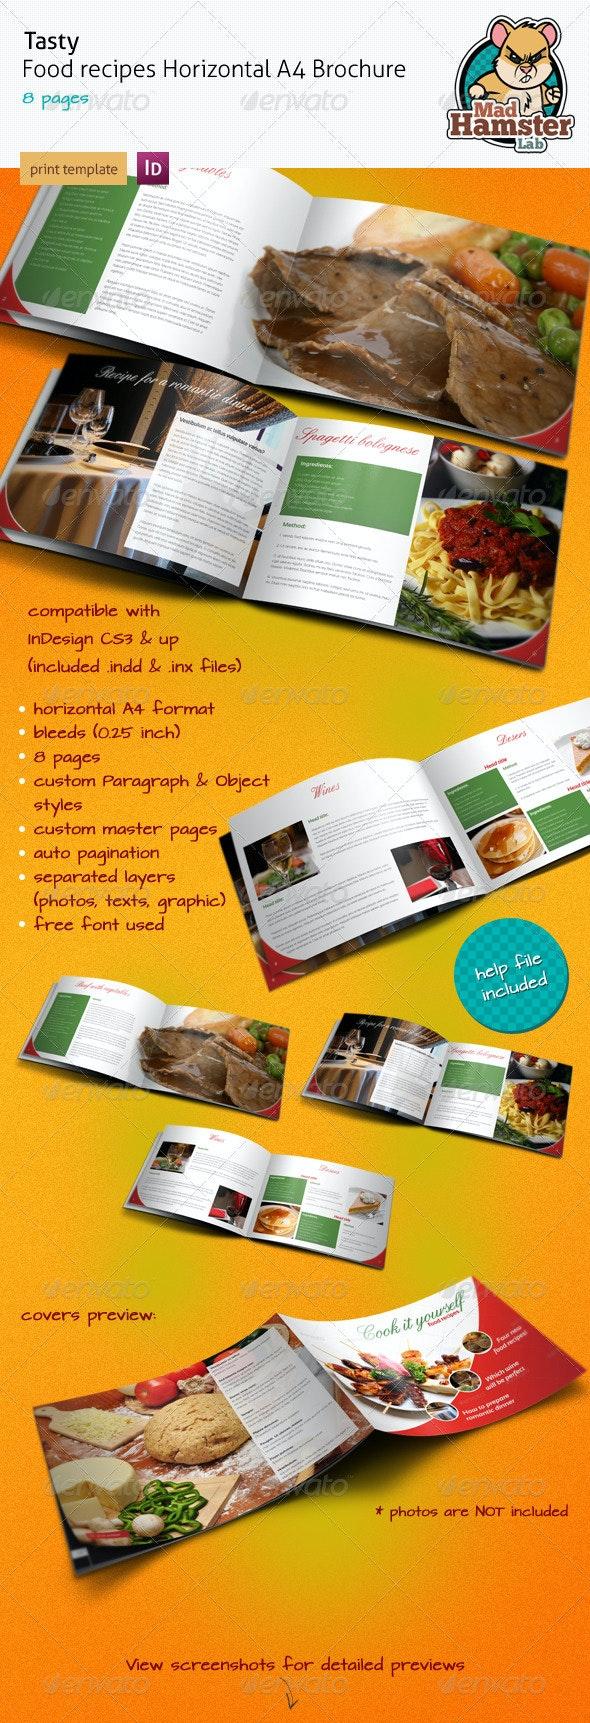 Tasty Food Recipe A4 Horizontal Brochure - Informational Brochures